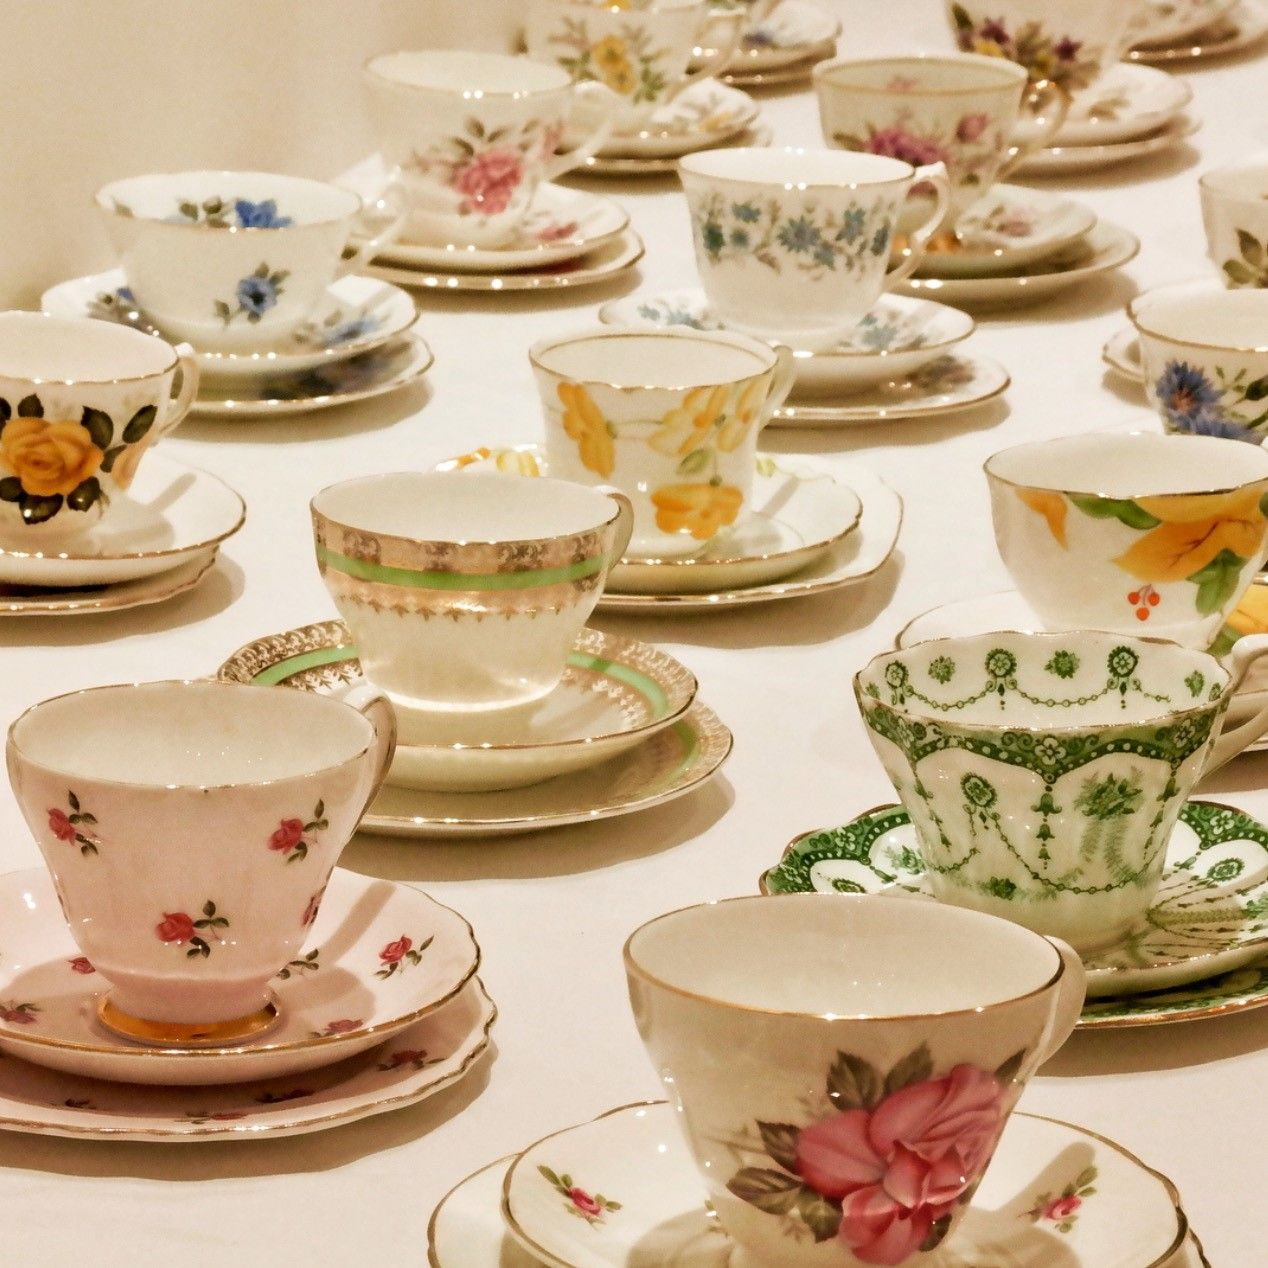 Vintage China Rentals West London Wedding china, Vintage